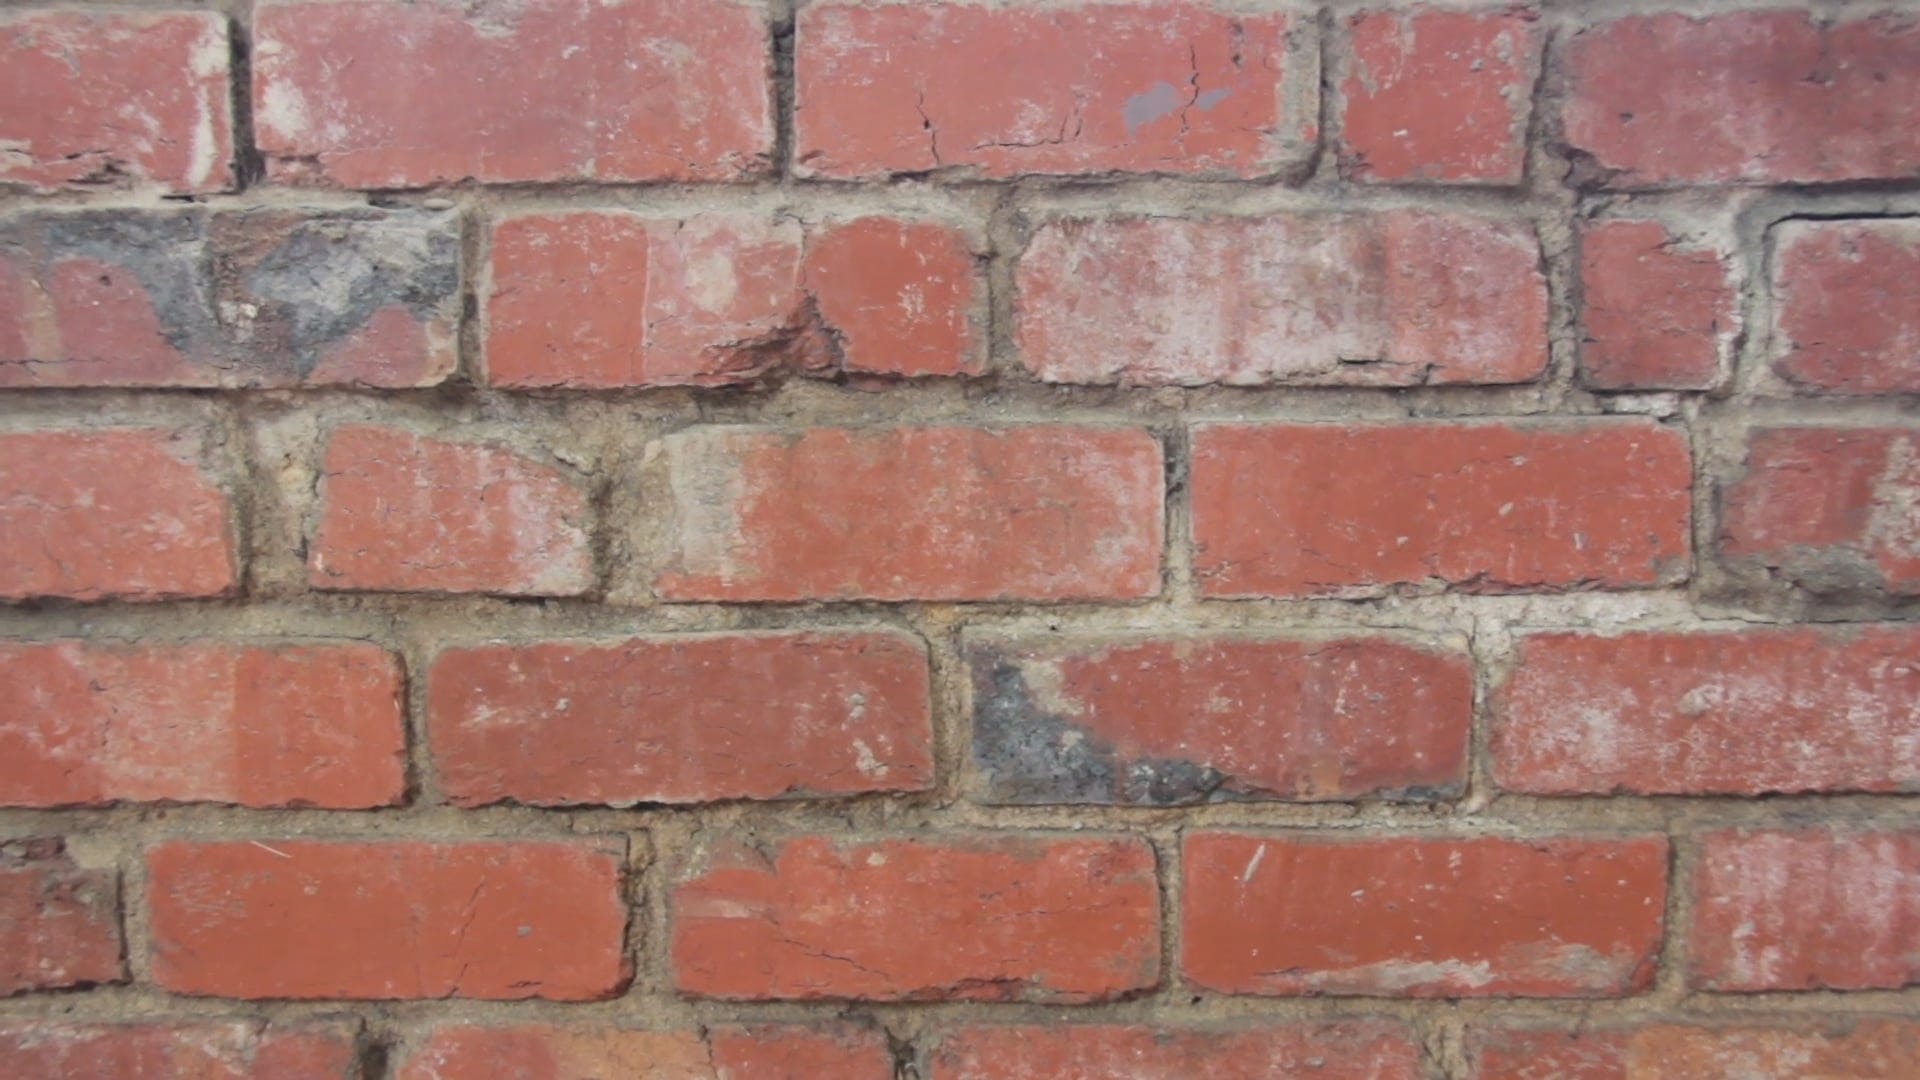 Close-Up Video Of Brickwall